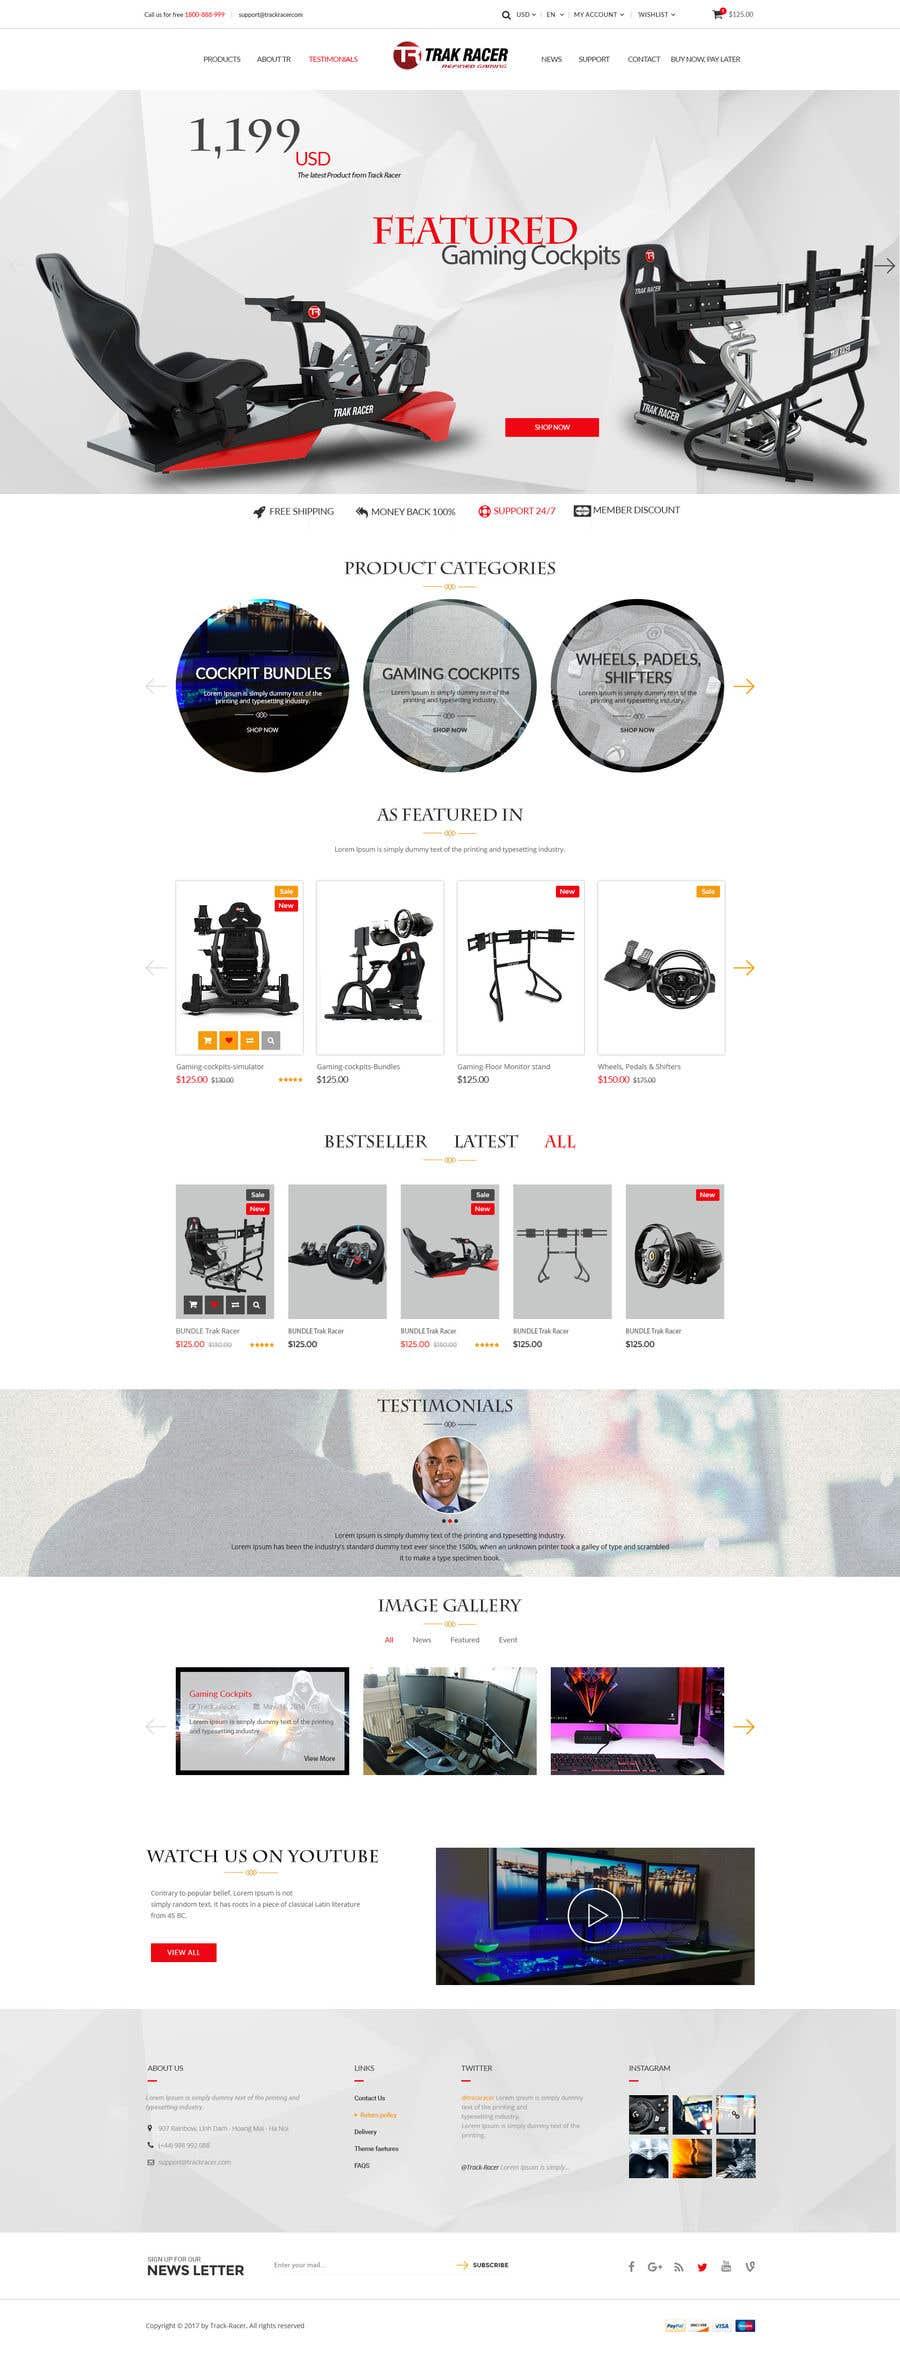 Penyertaan Peraduan #21 untuk Design a home page including header and footer